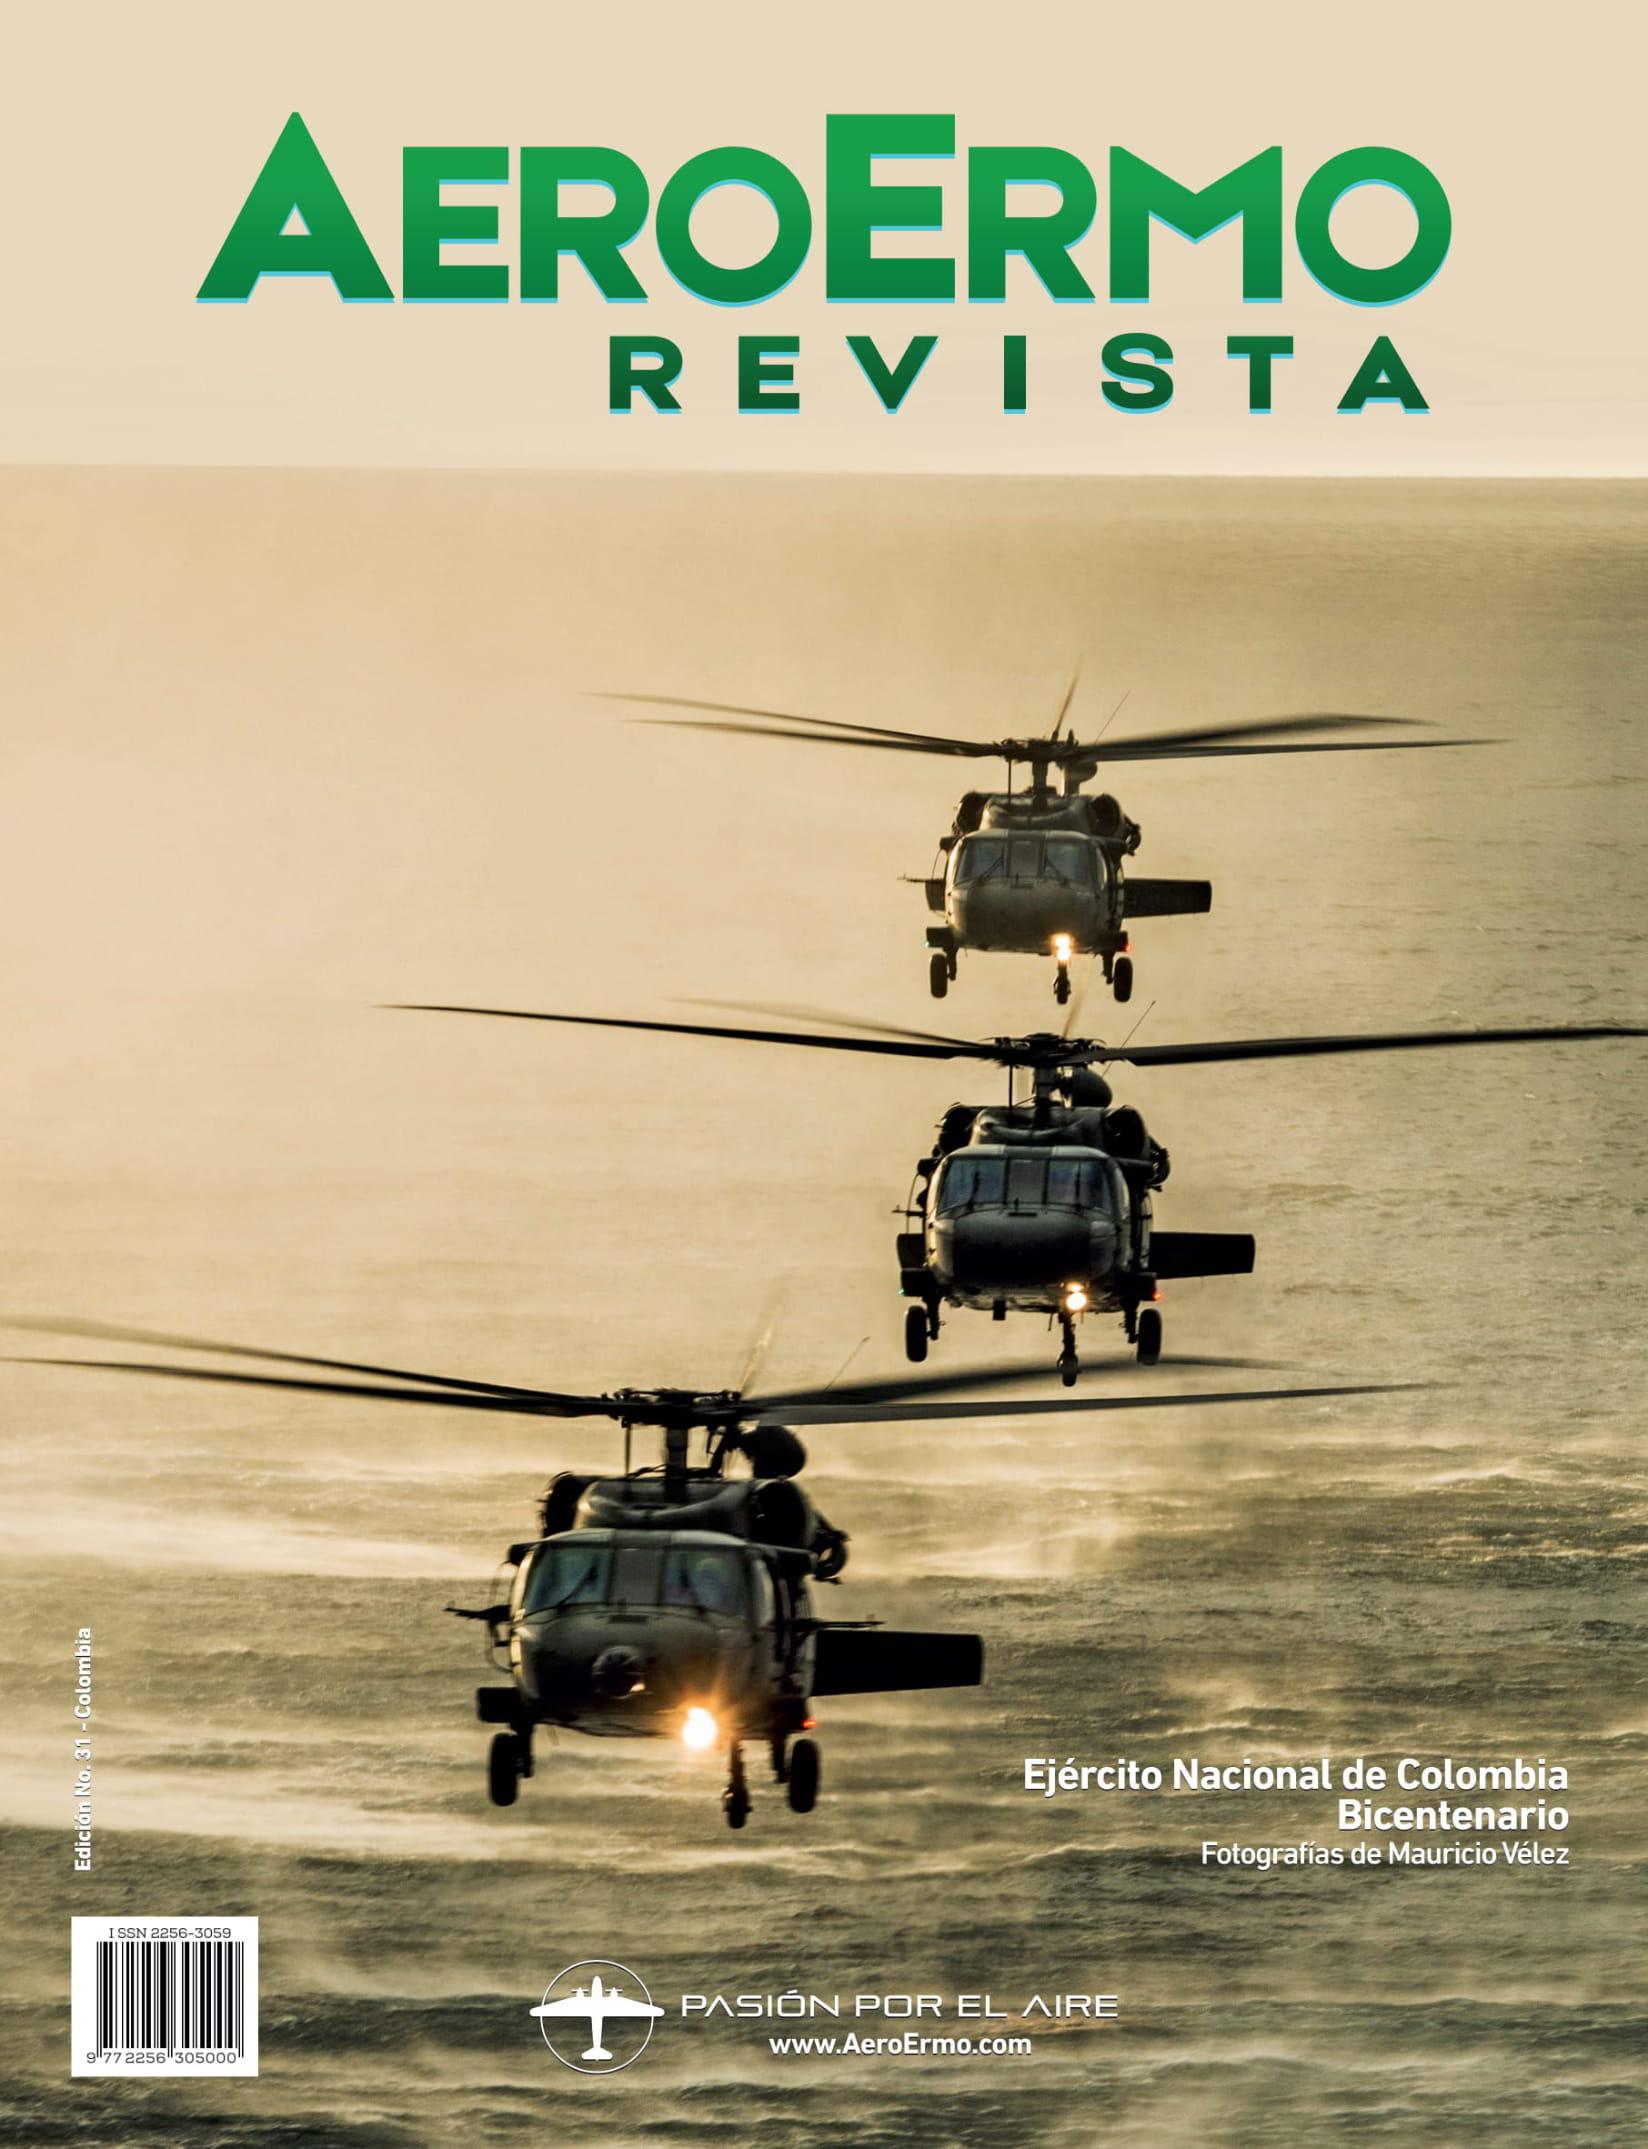 AeroErmo Revista(Colombia)_Lebanese Air Force-1